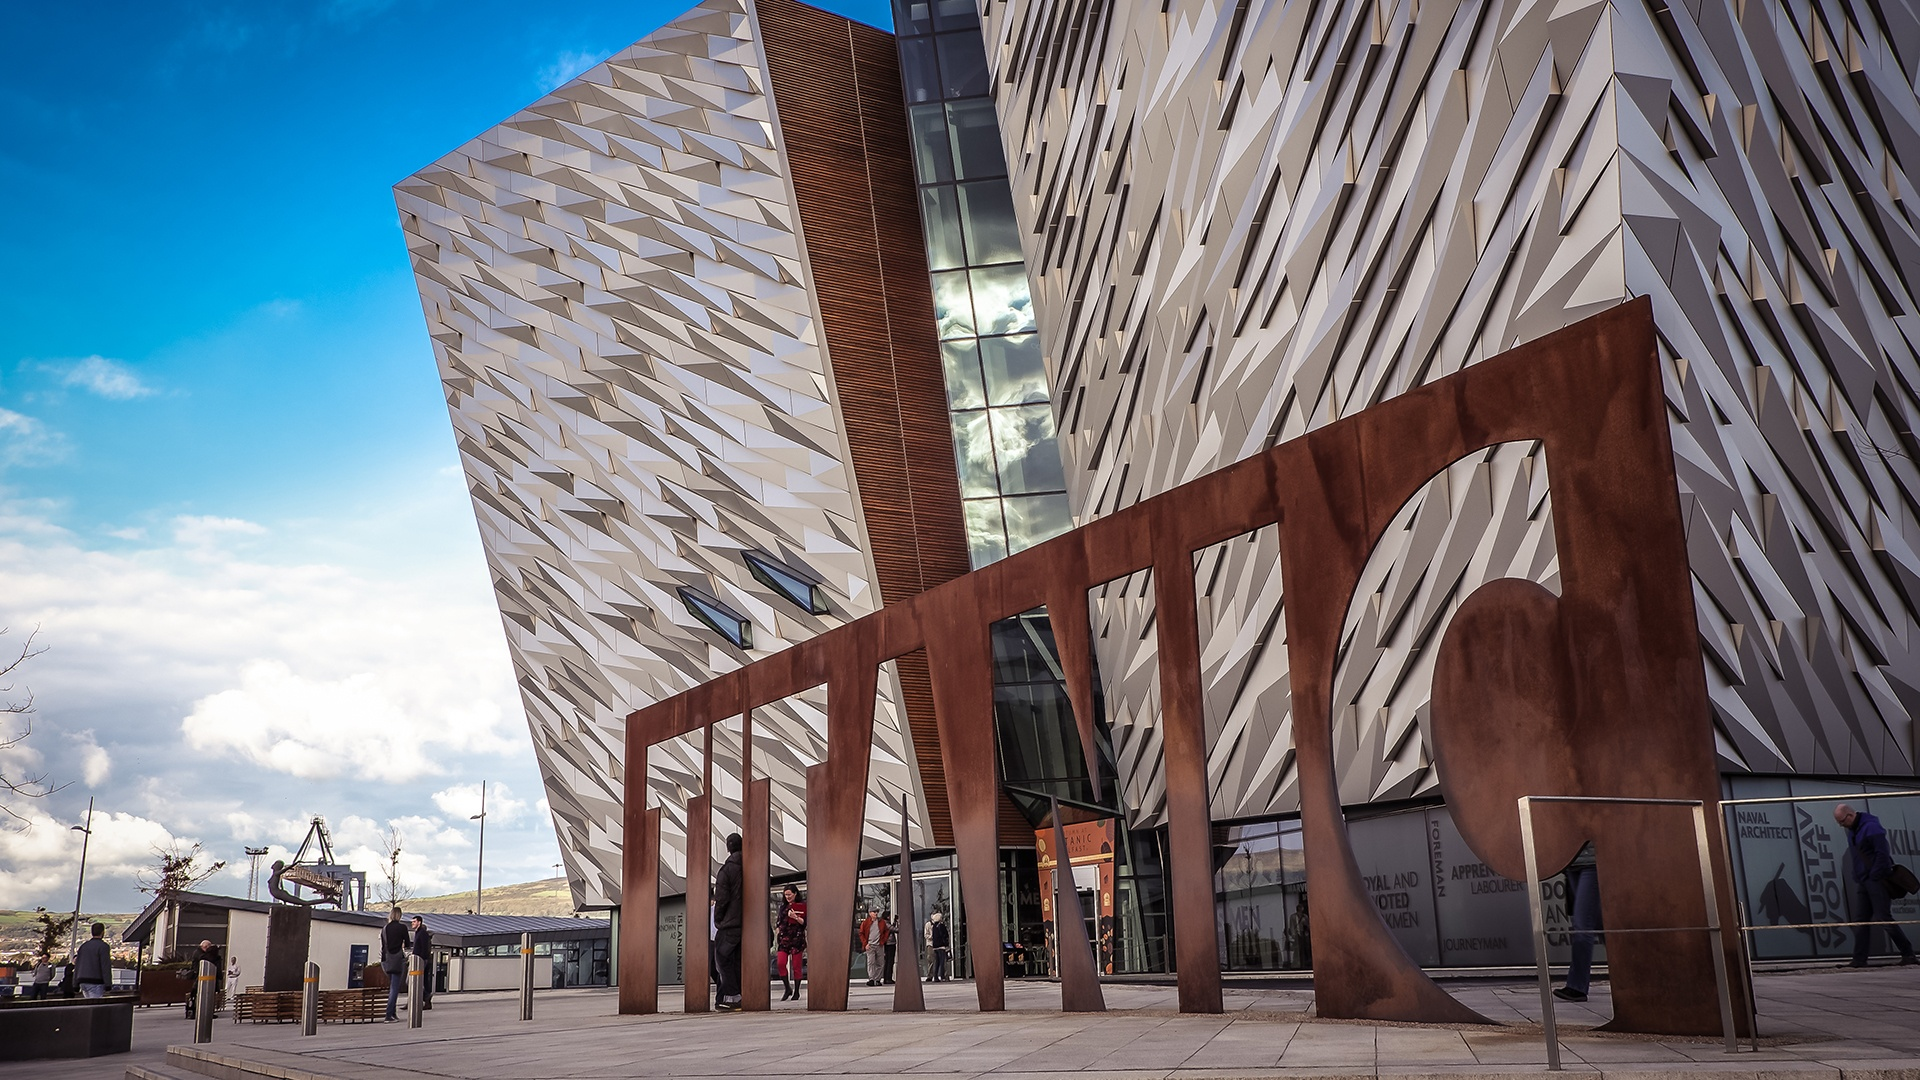 Belfast: Titanic Experience